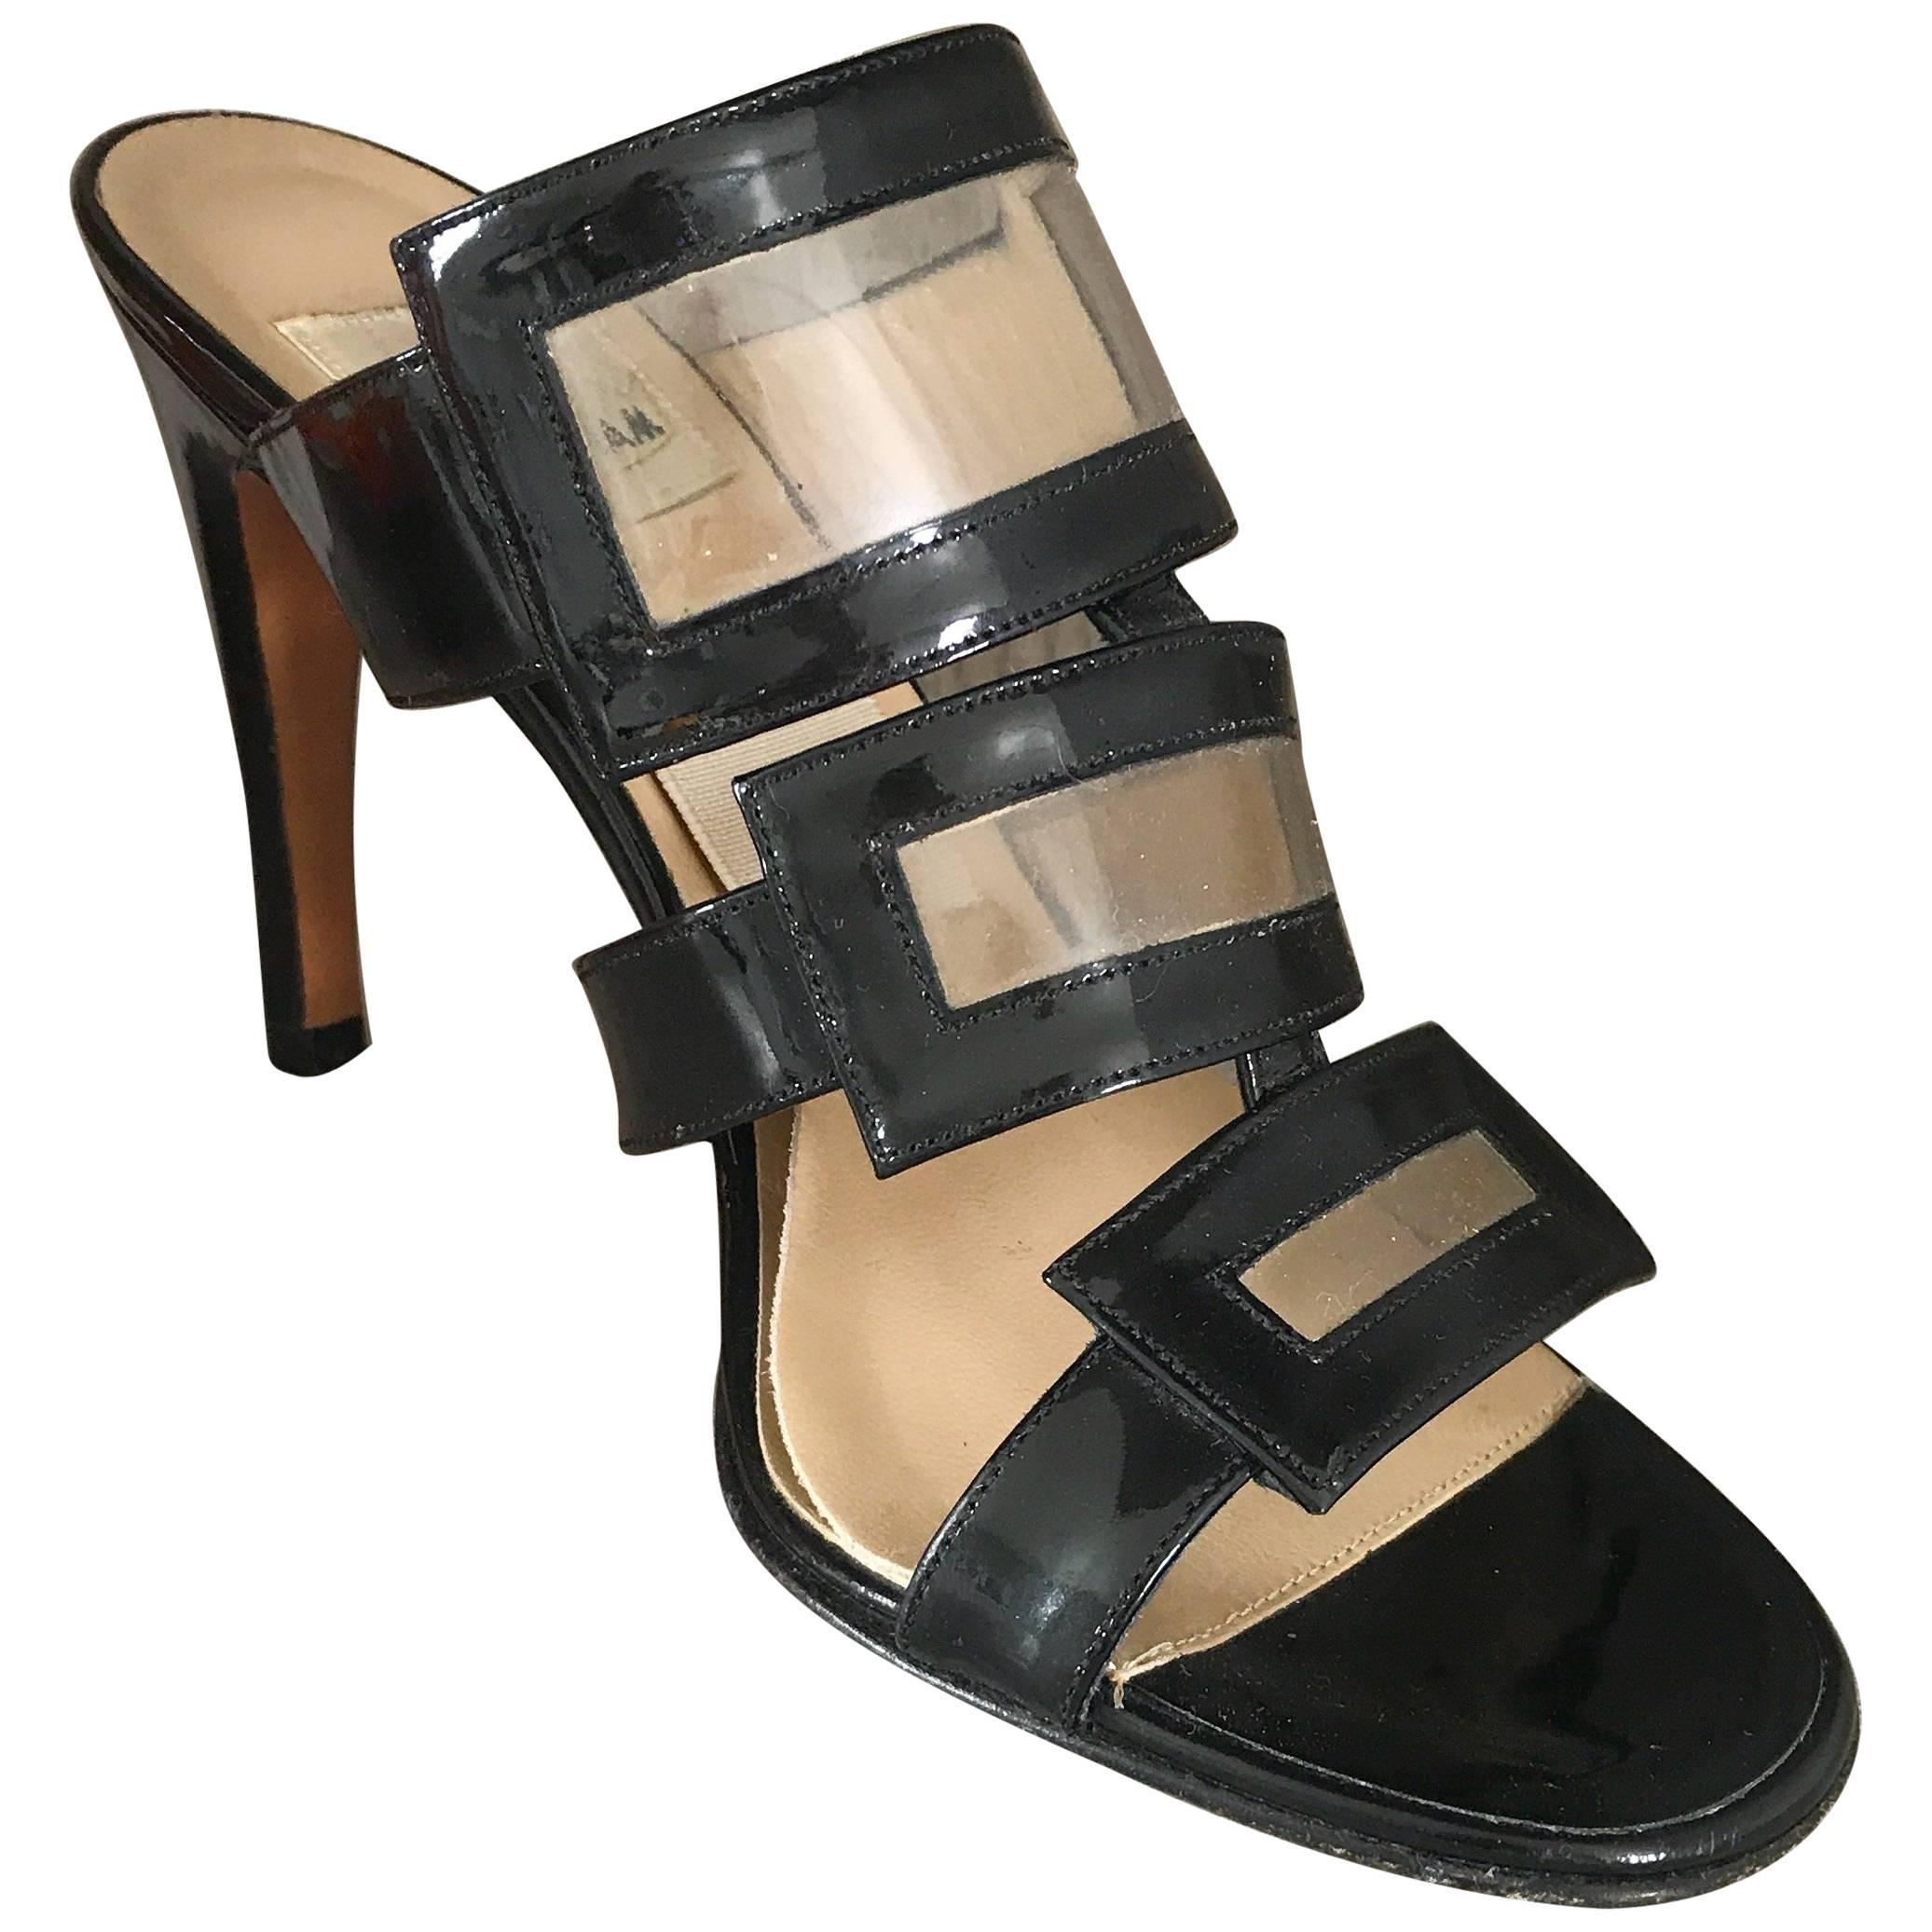 1990s Todd Oldham Black Patent Leather Size 37 / 7 Springolator 90s High Heels